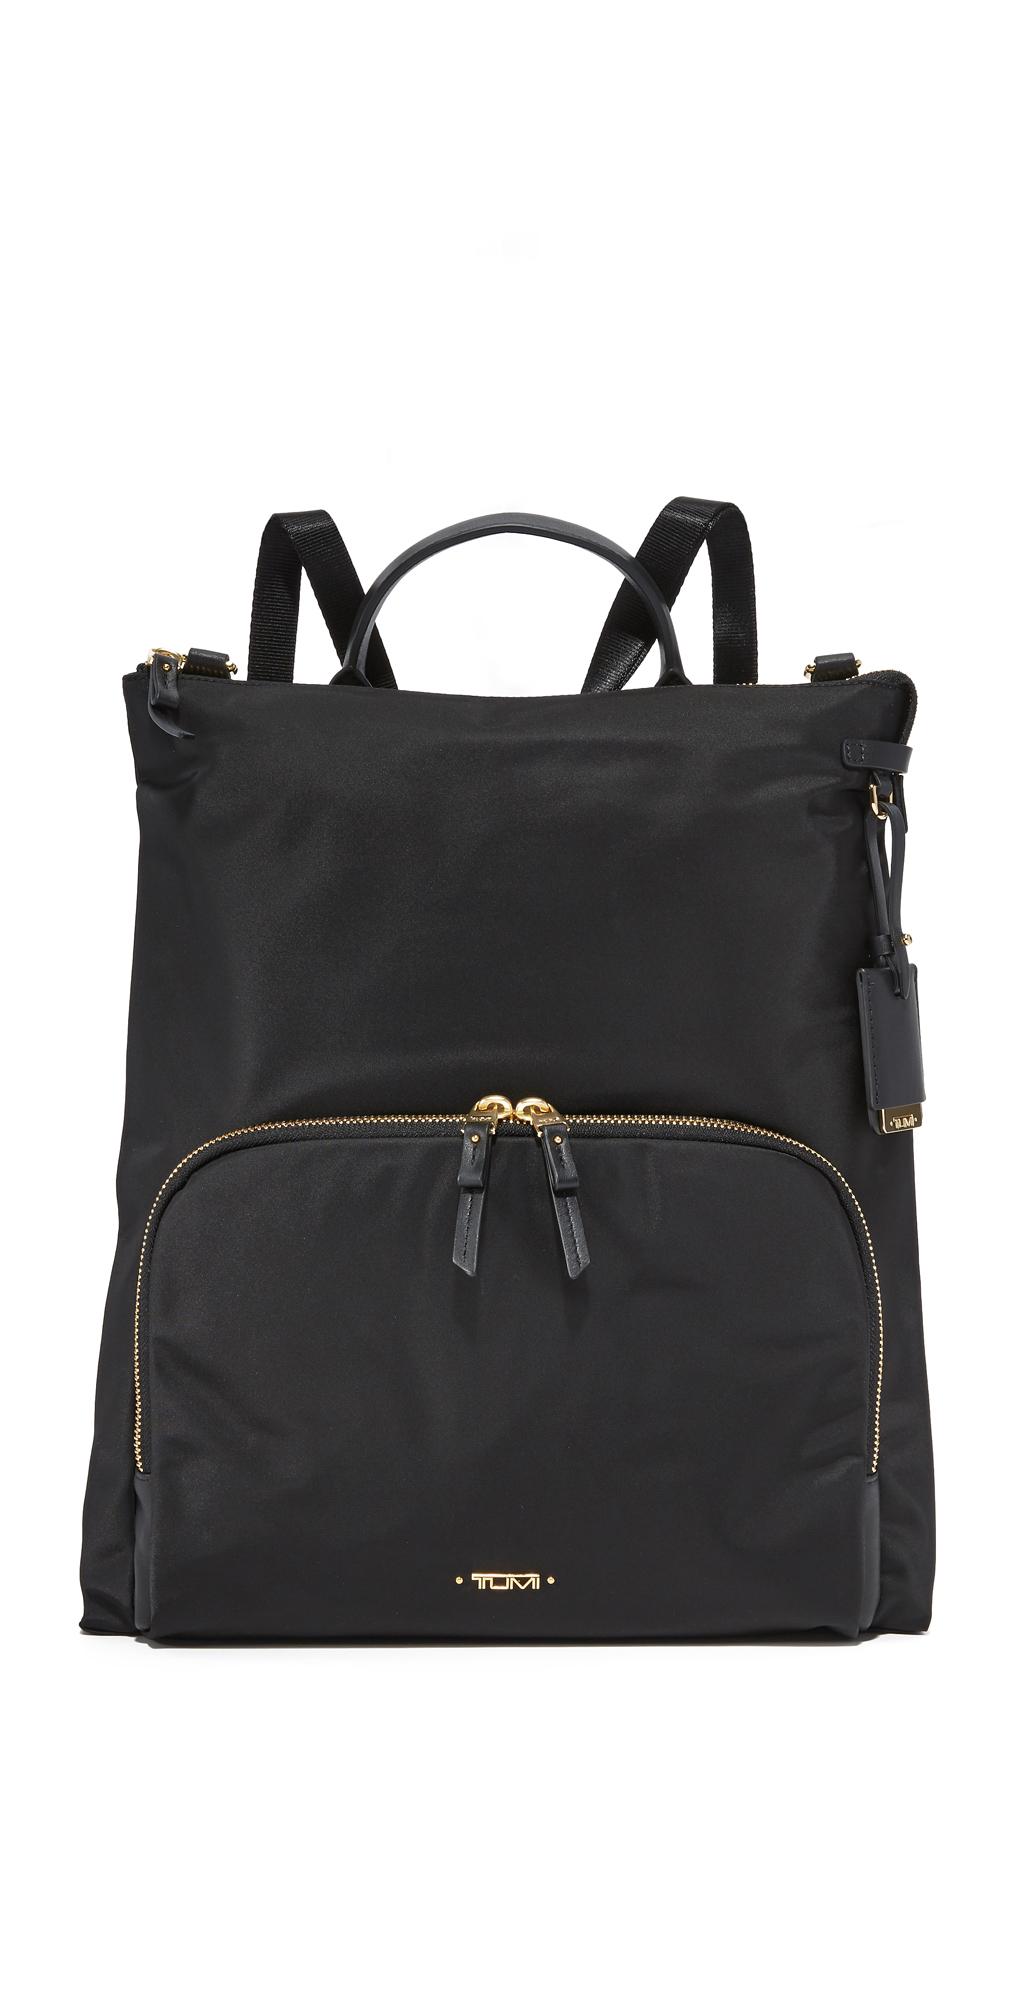 Jackie Convertible Cross Body Bag Tumi